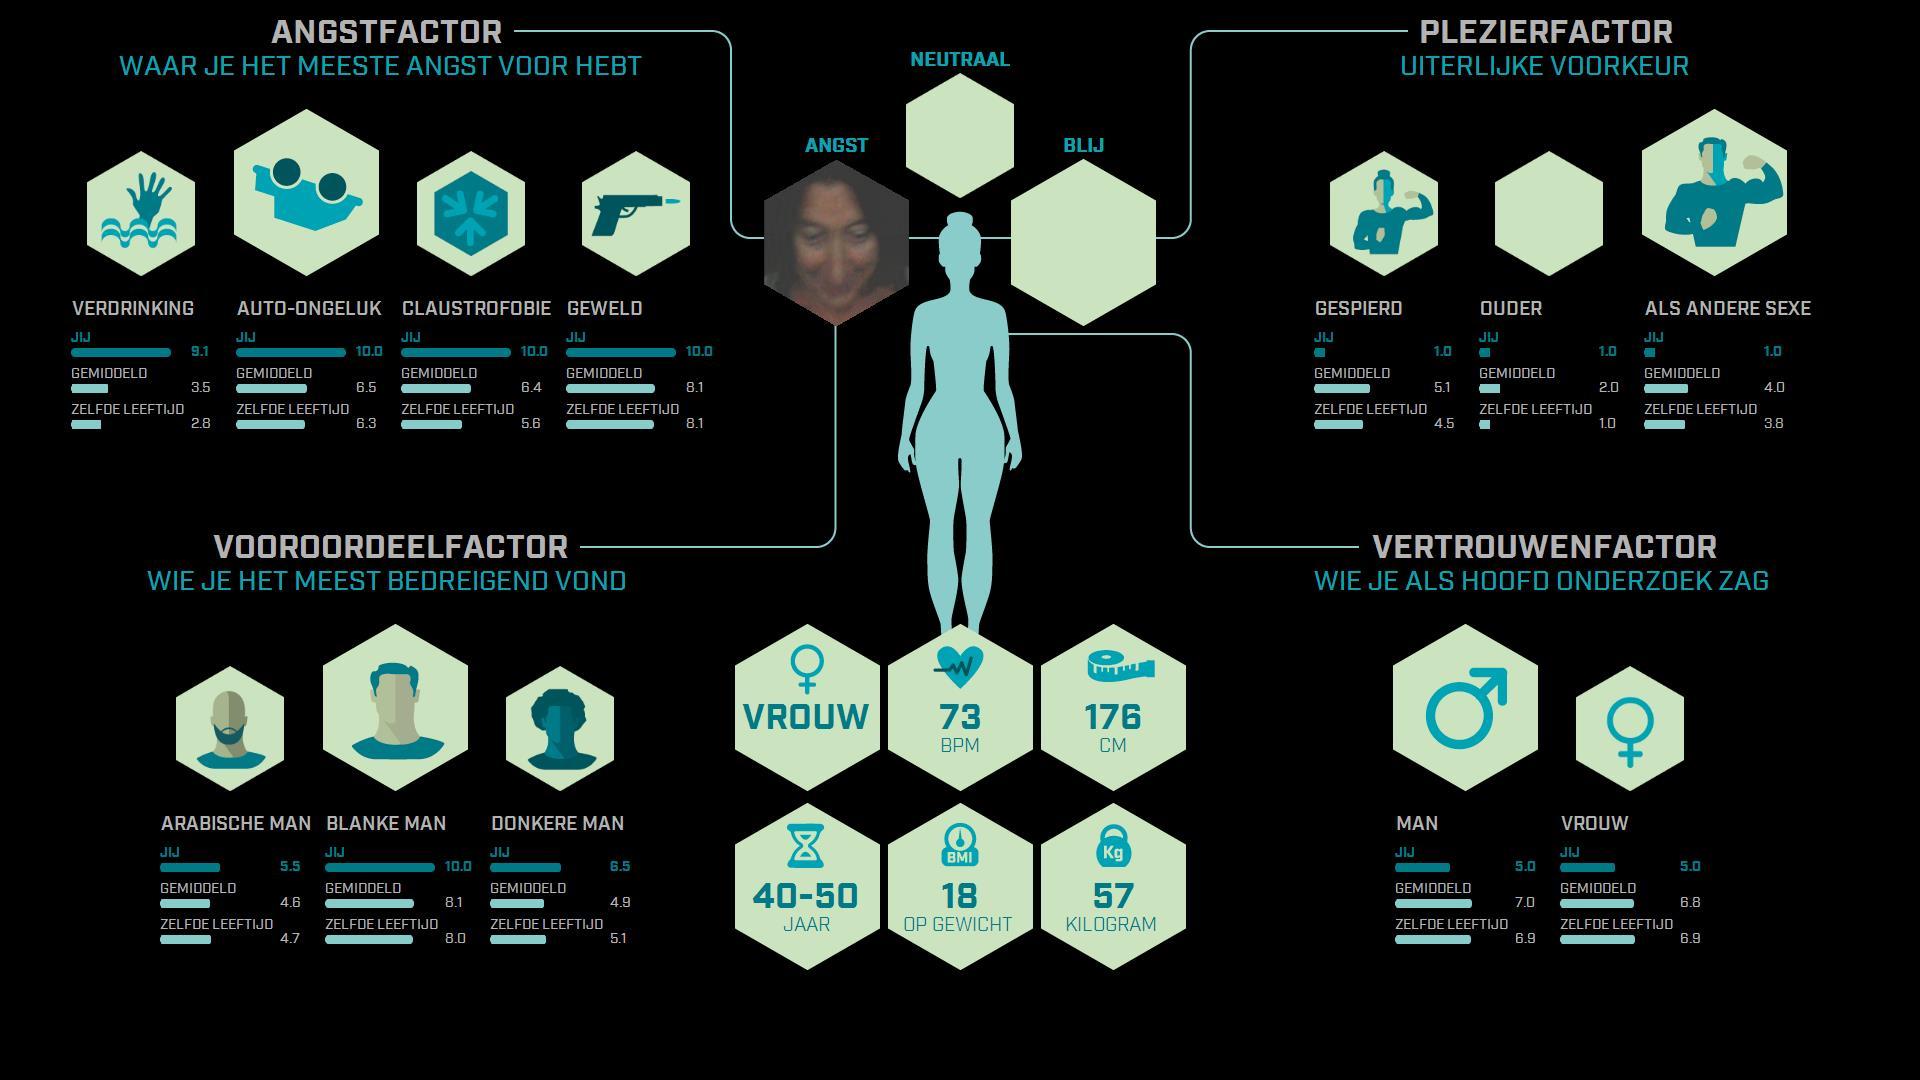 Profile lucienne